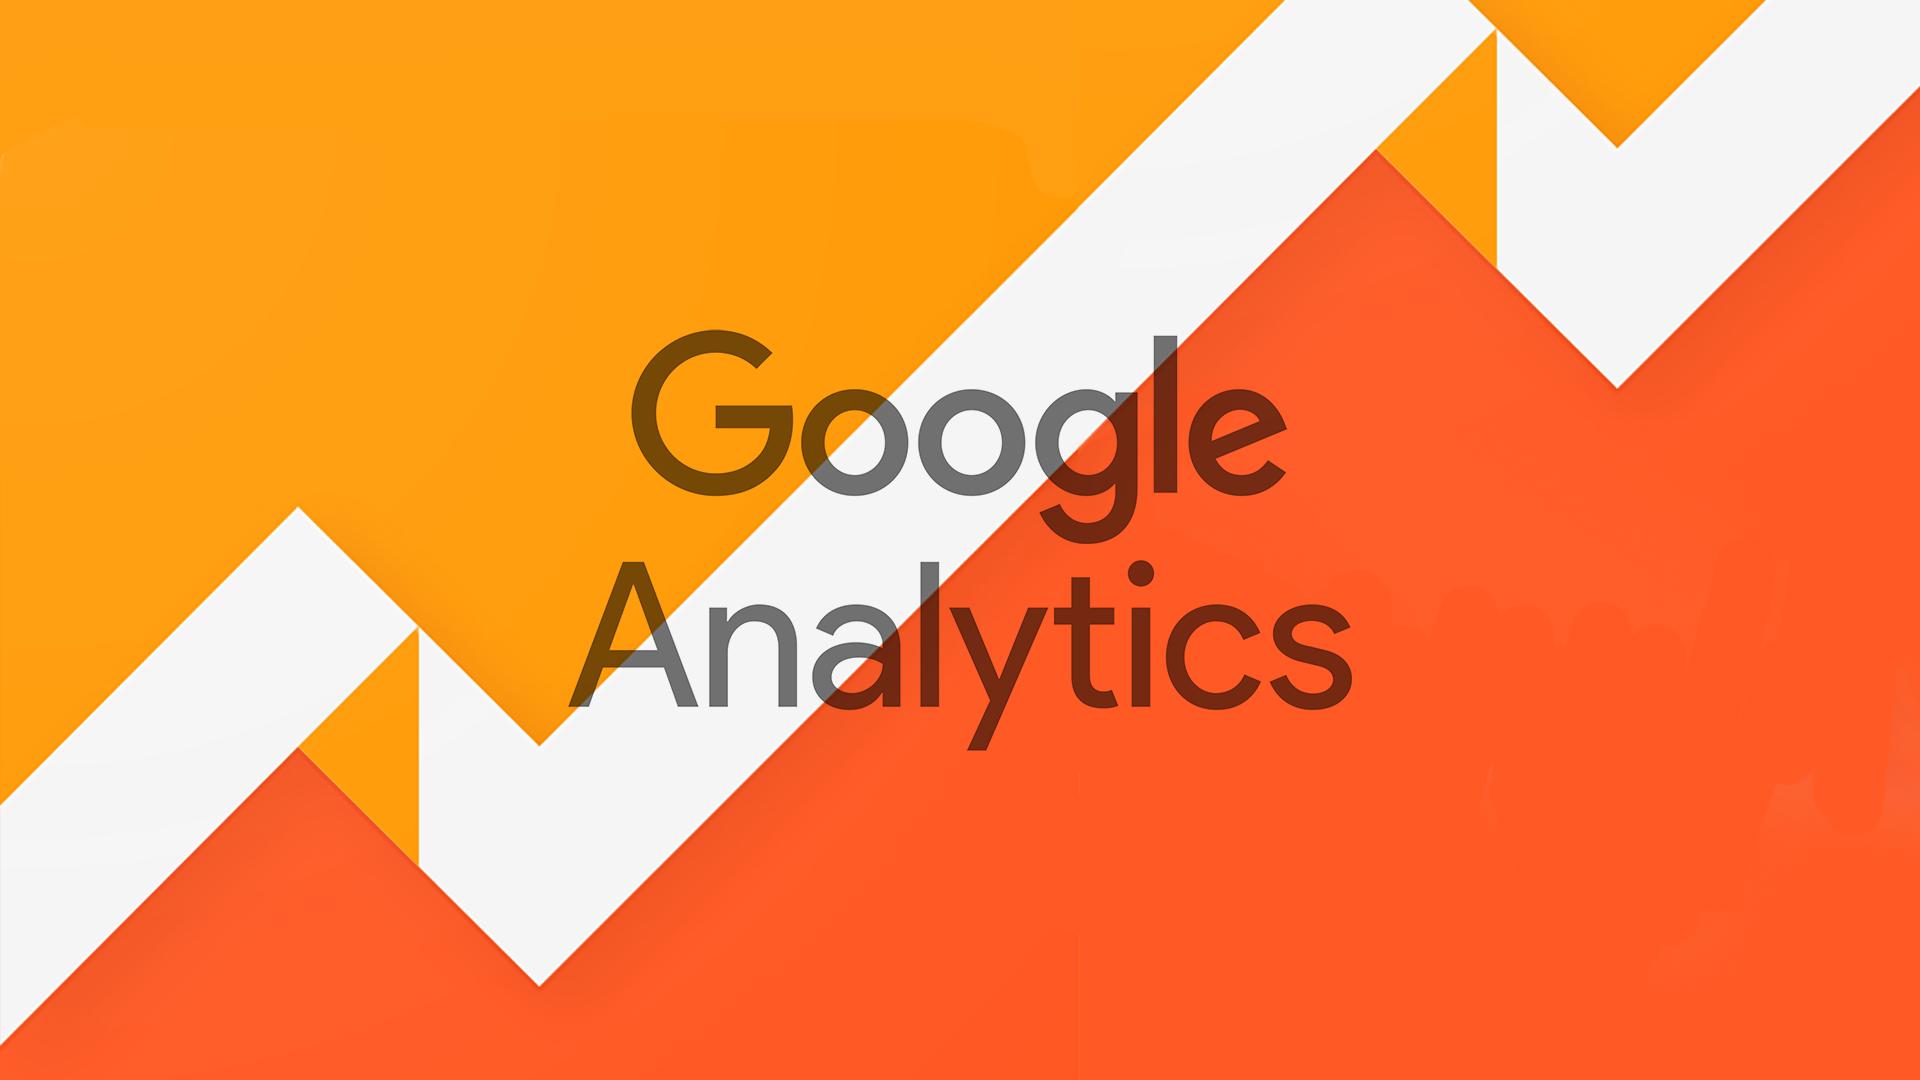 google-analytics-name-block-1920